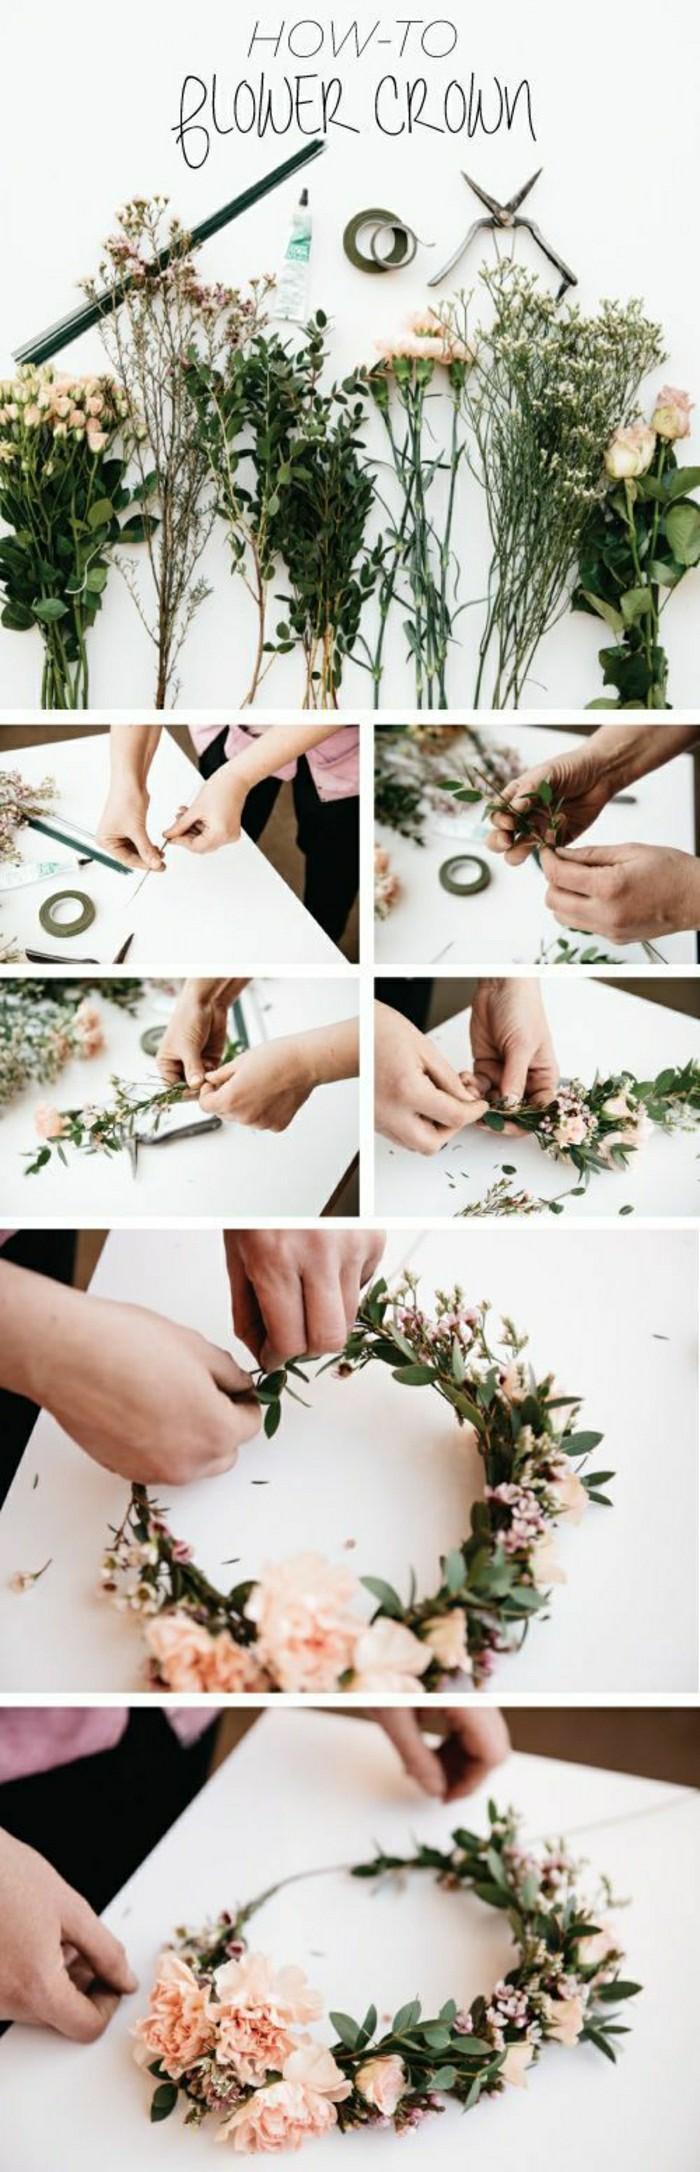 0-thème-de-mariage-diy-coronne-de-fleurs-mariage-diy-en-fleurs-champetres